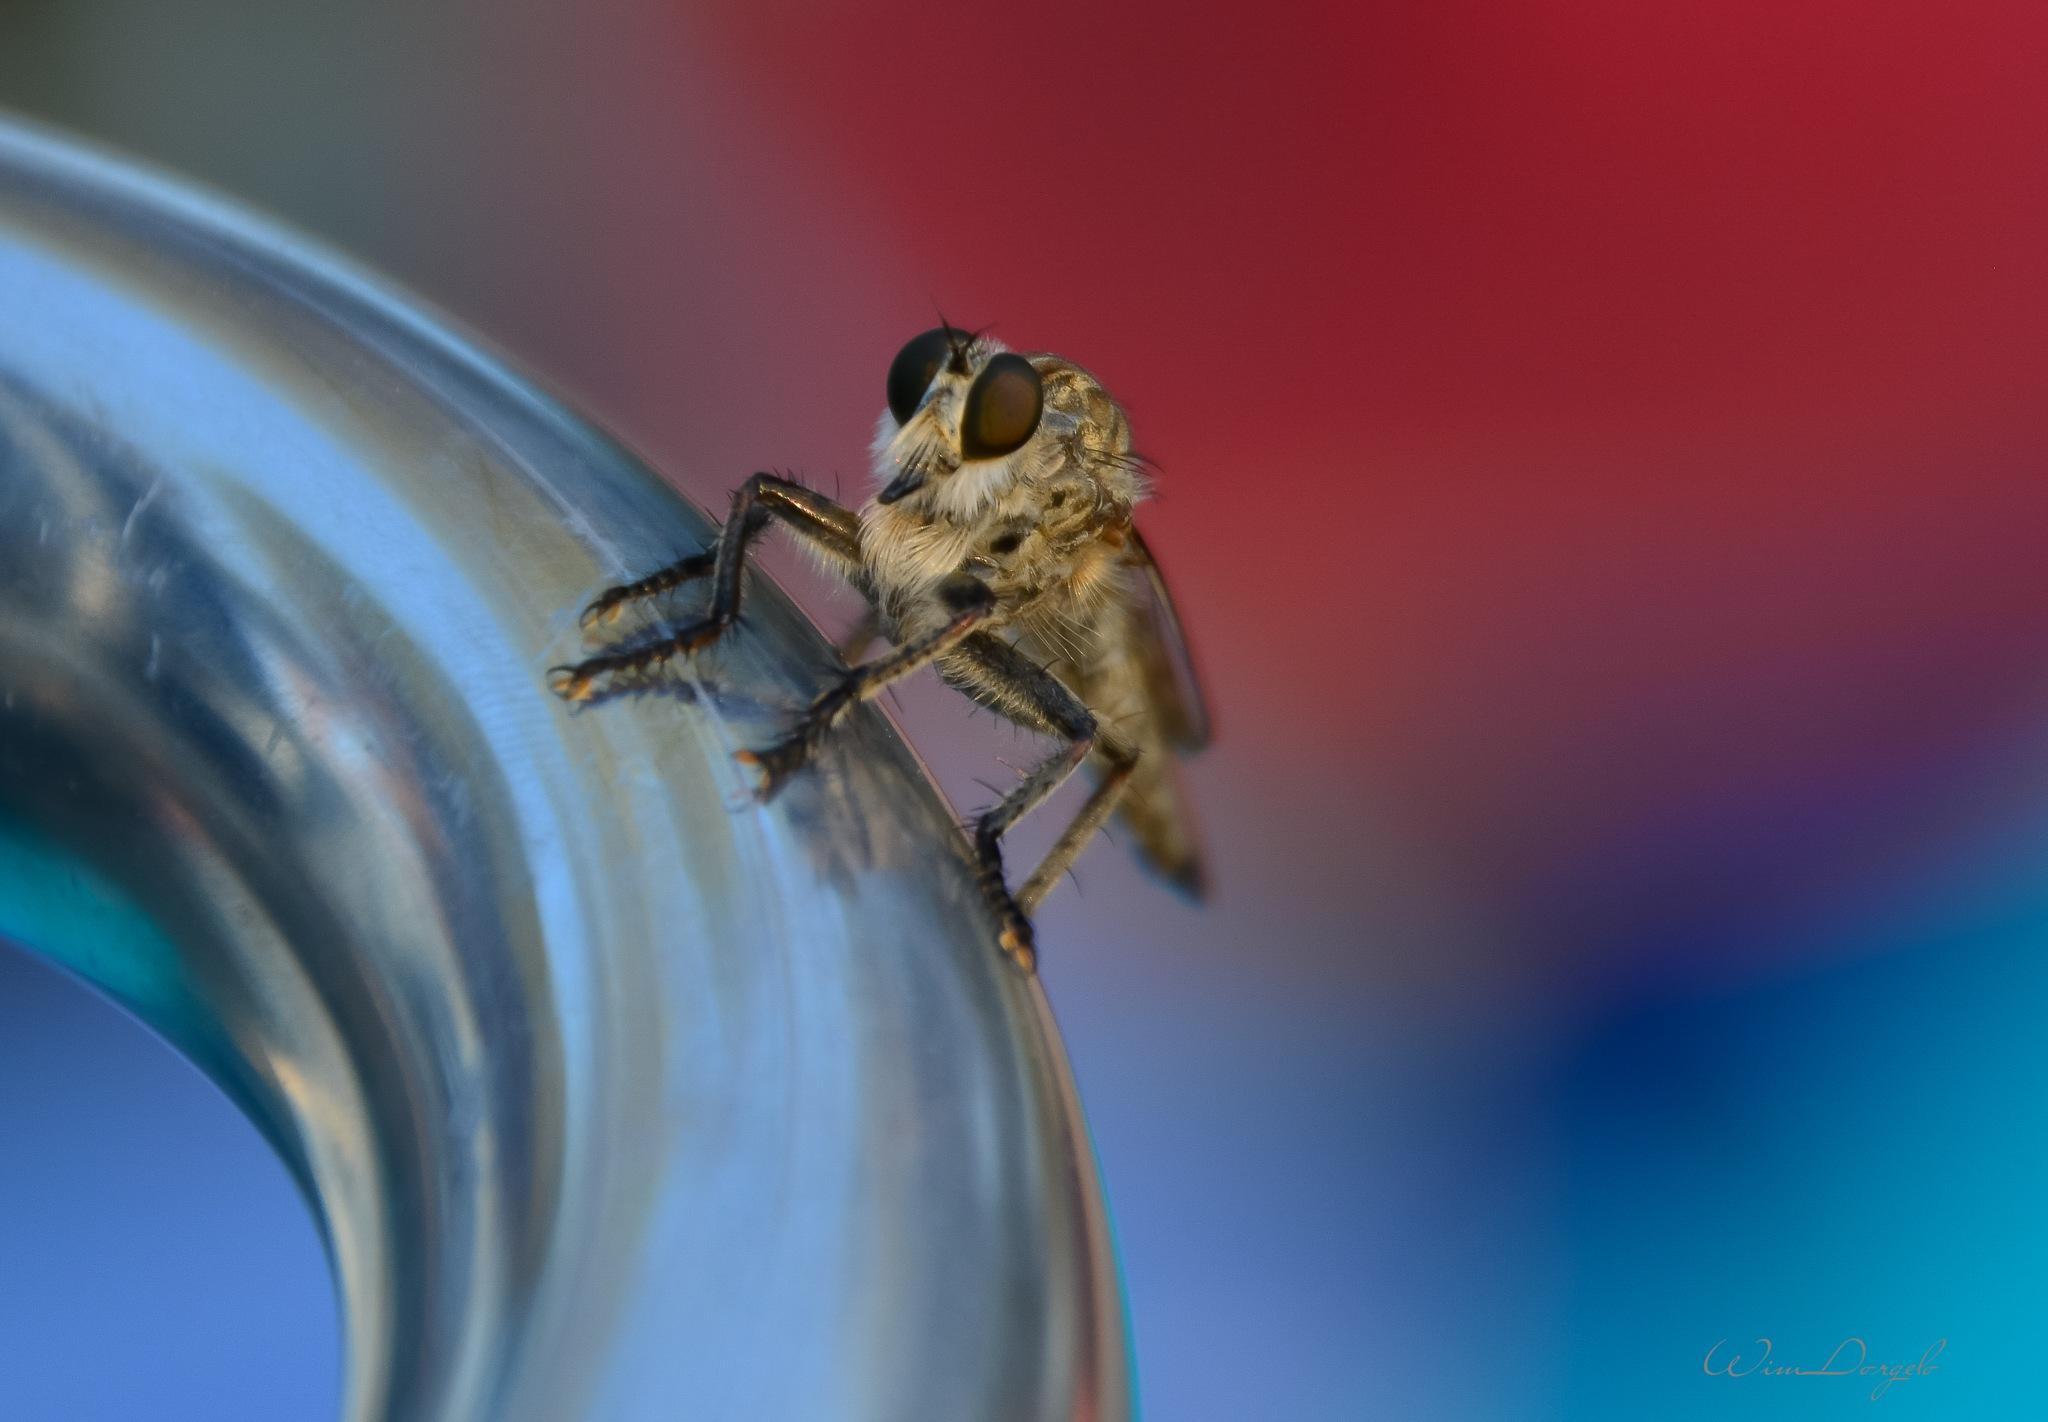 Grasshopper by Wim Dorgelo